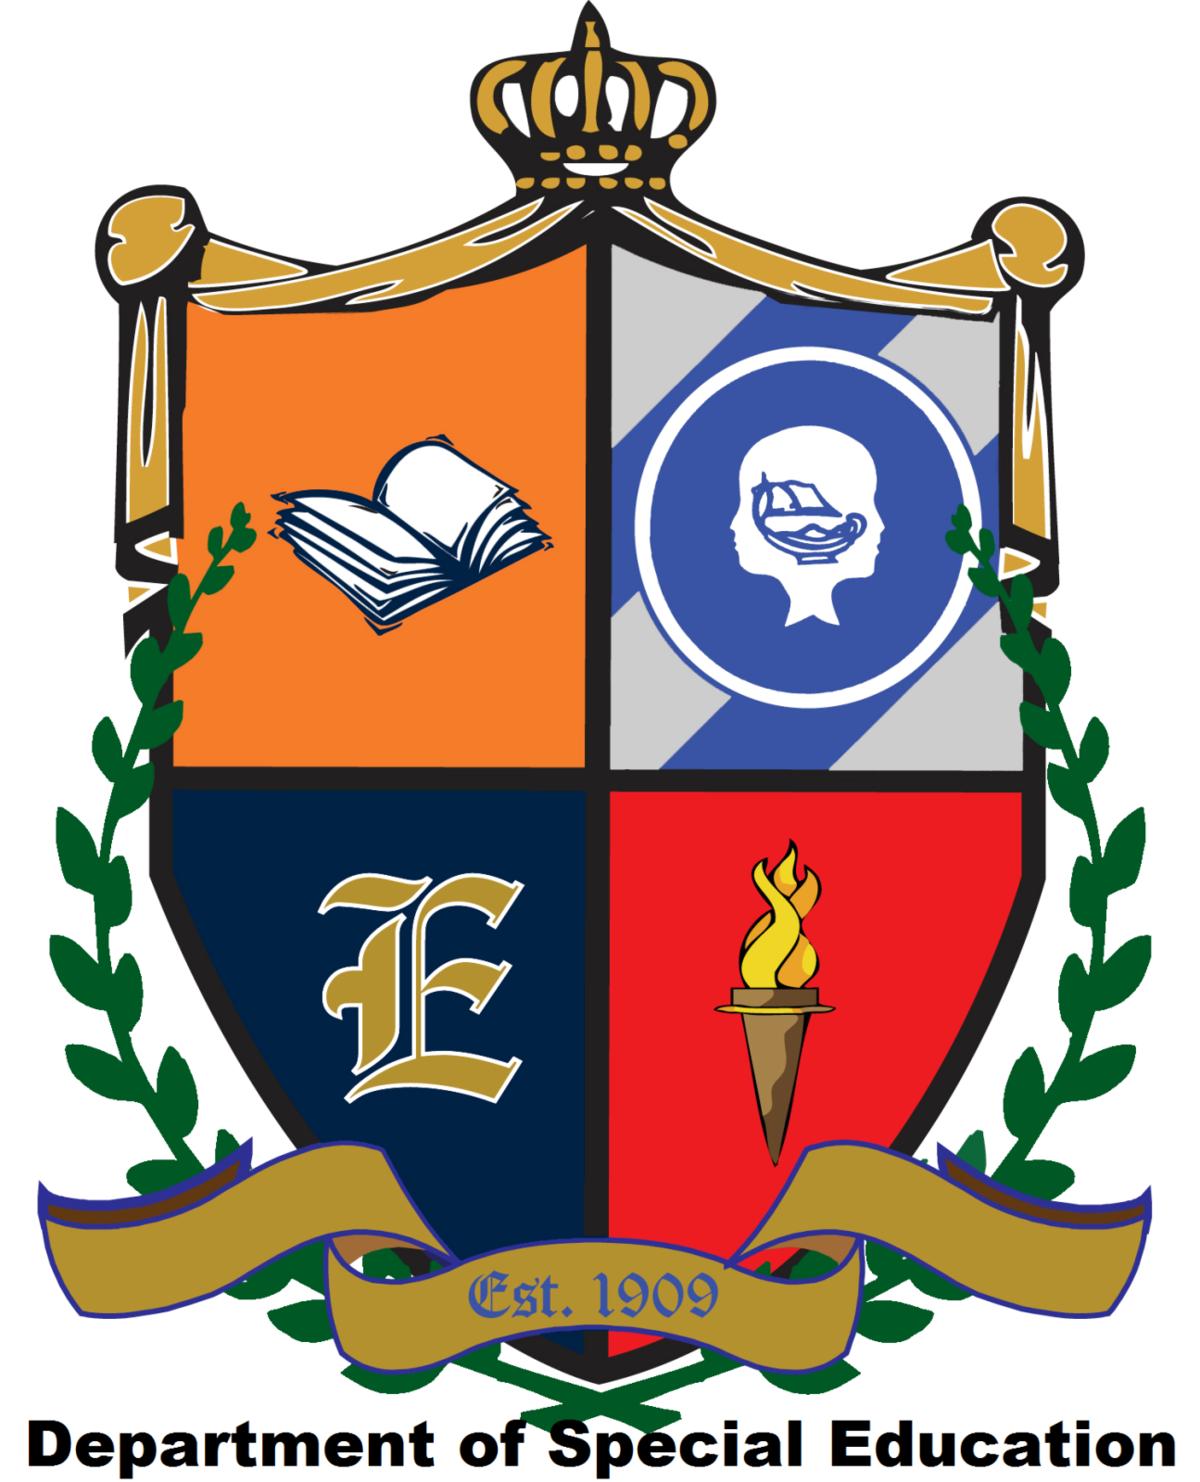 Staff clipart conclusion With declare grievance logo teachers